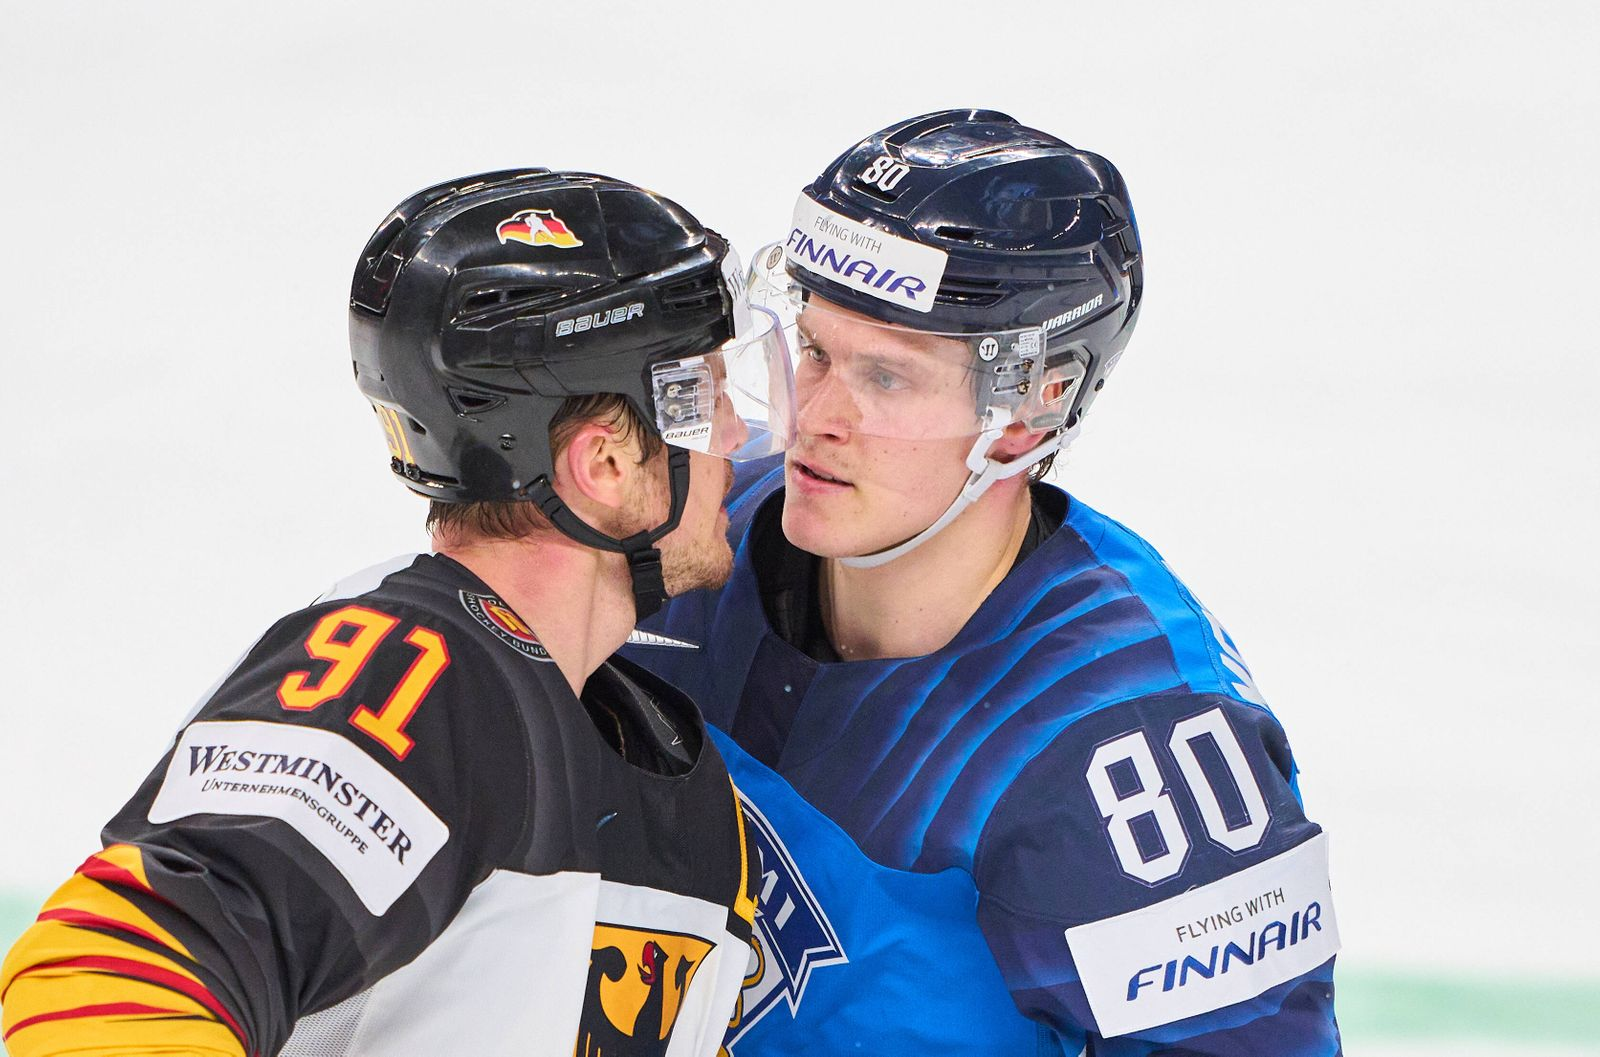 Moritz Müller, Mueller 91 of Germany against Saku Maenalanen 80 of Finland GERMANY - FINLAND IIHF Ice hockey, Eishockey